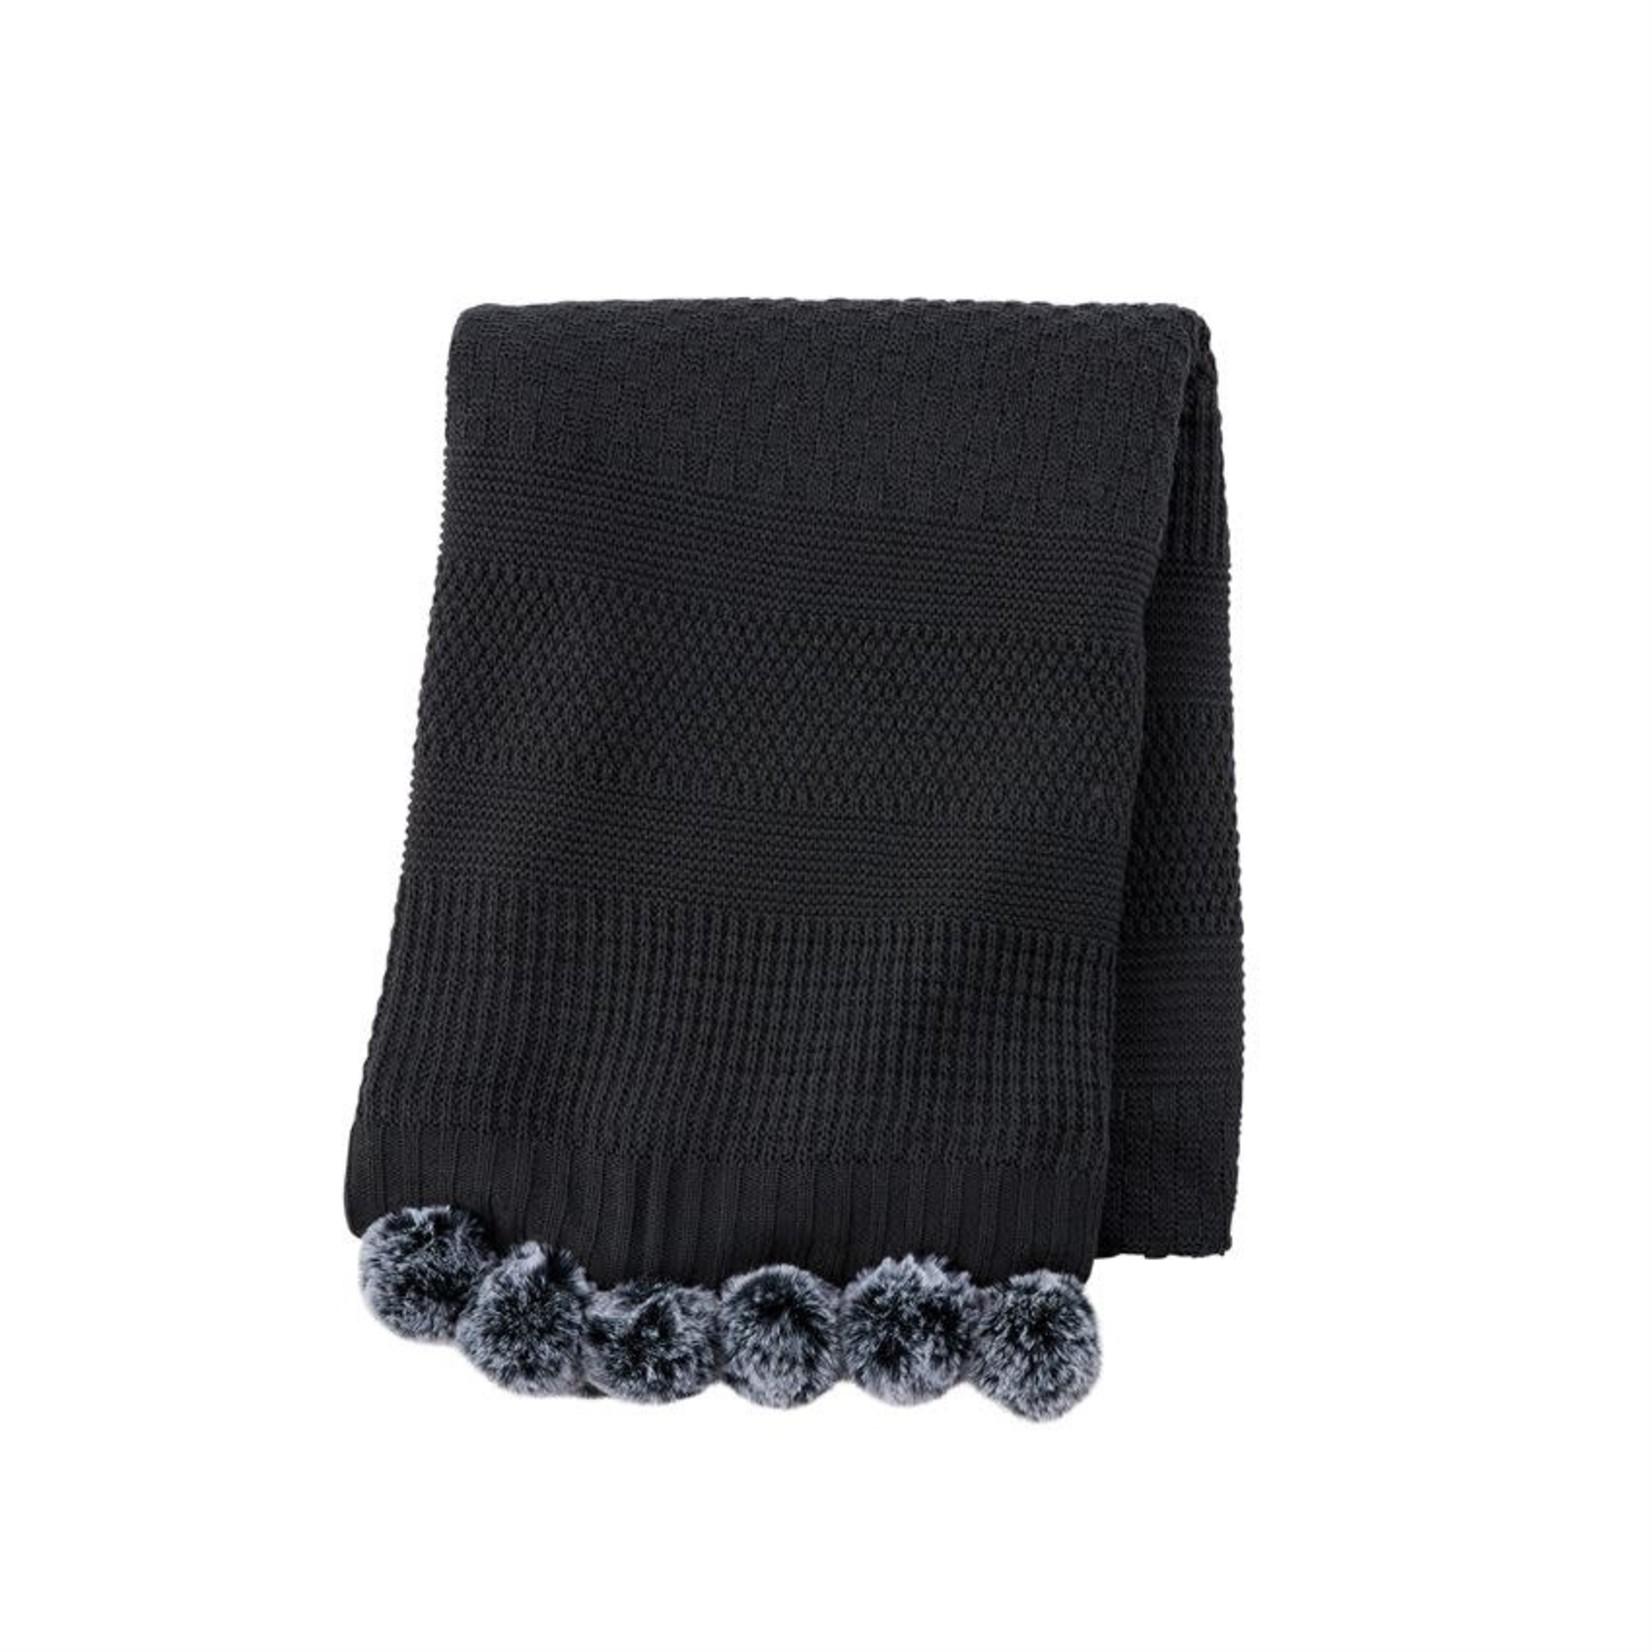 Knit Blanket with Fur Pom Pom (Multiple Options)